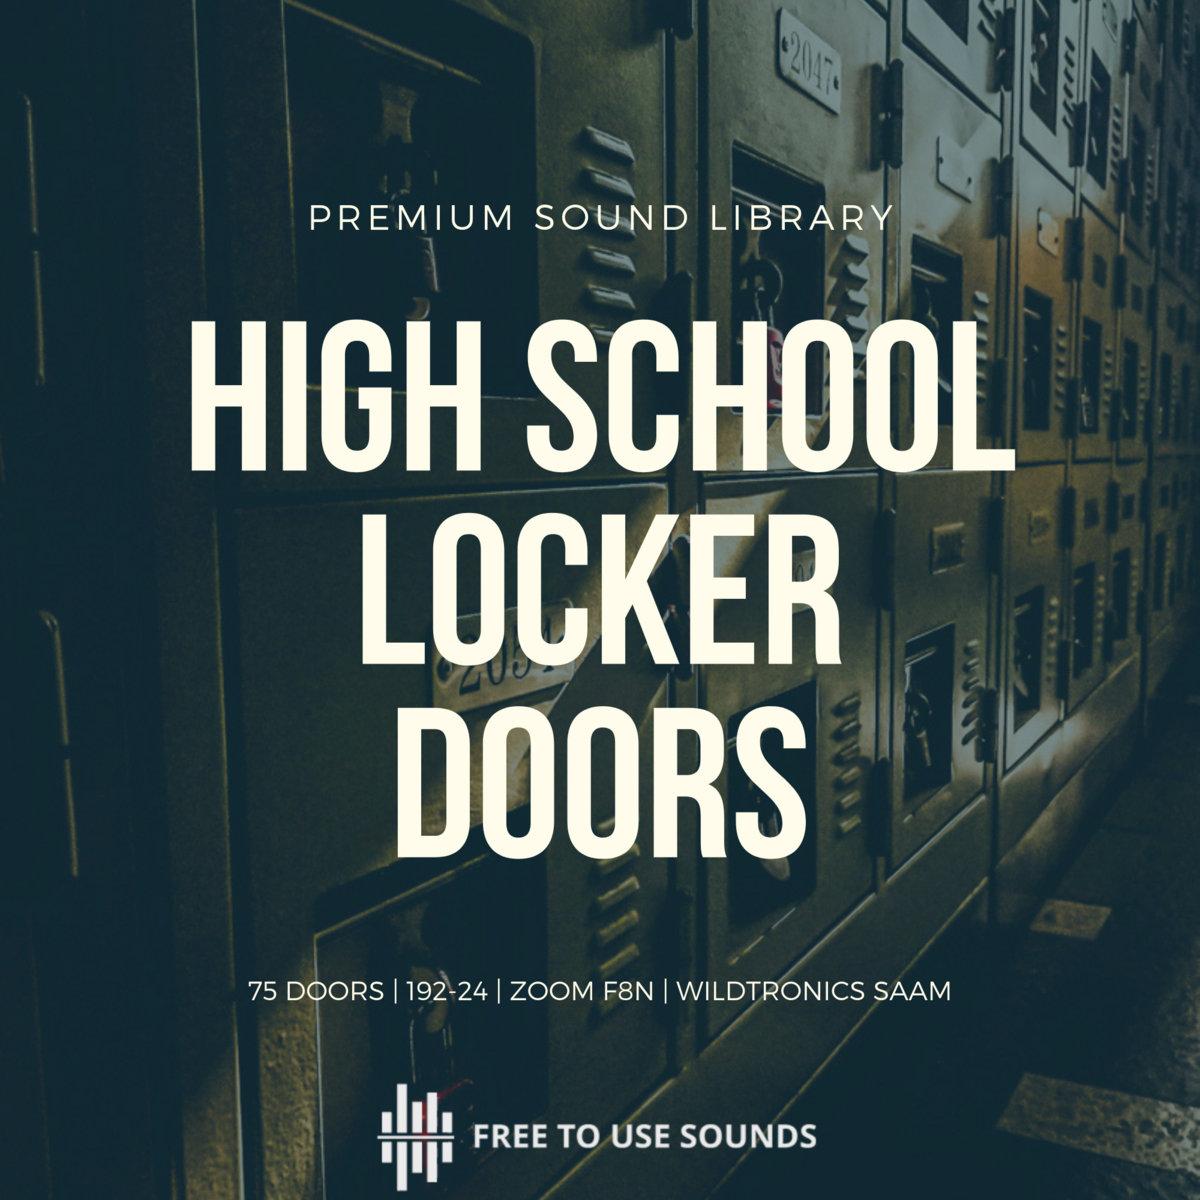 School Locker Door Sounds Open Closing Freetousesounds